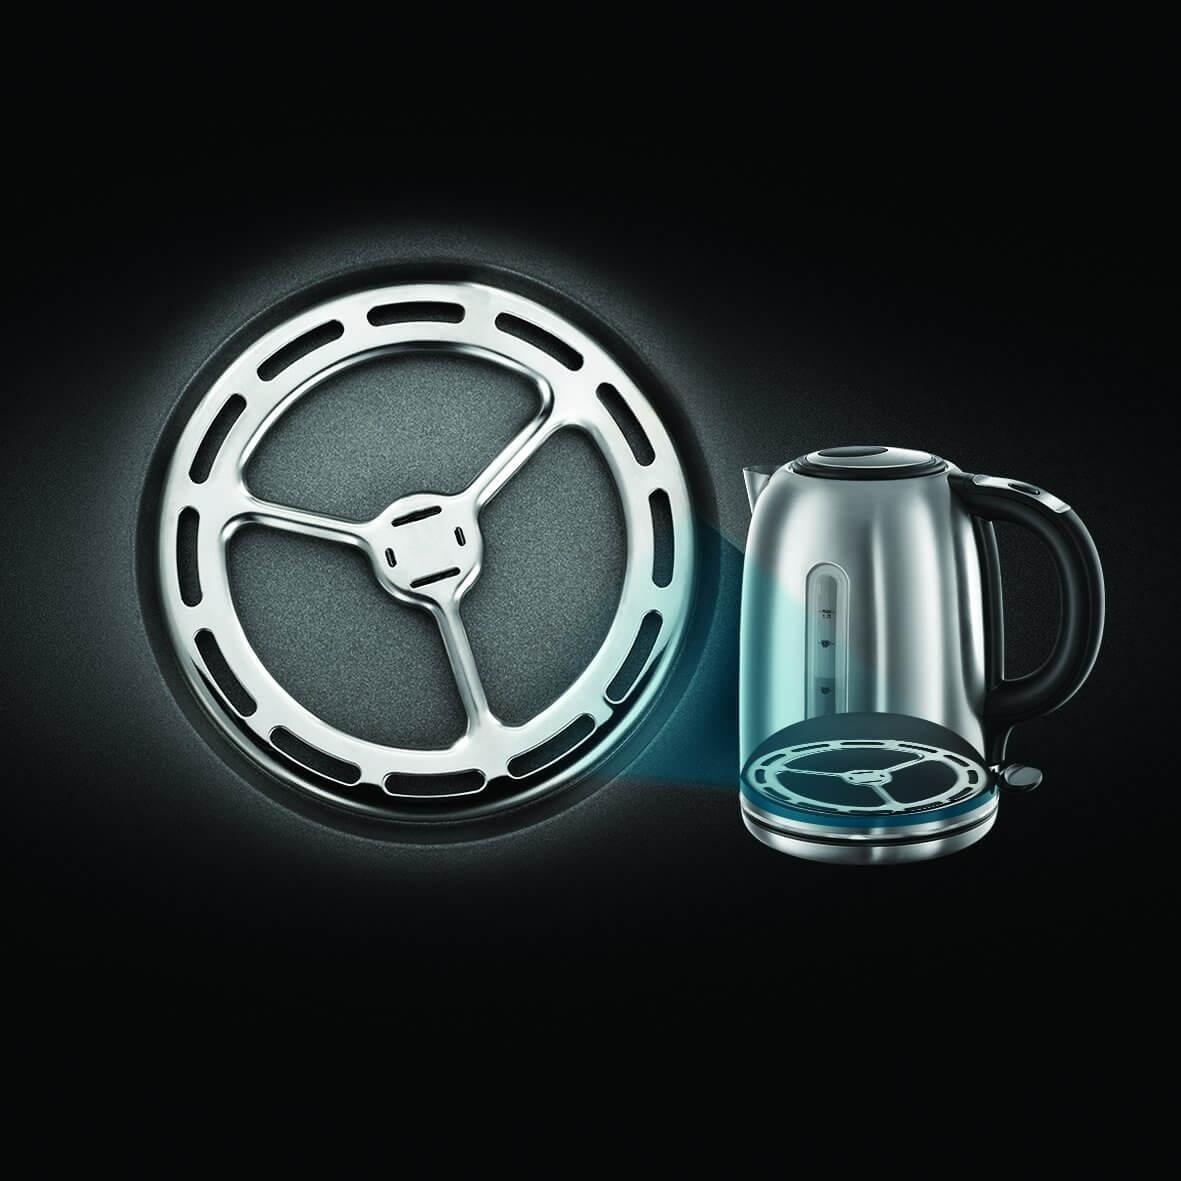 Czajnik i herbata